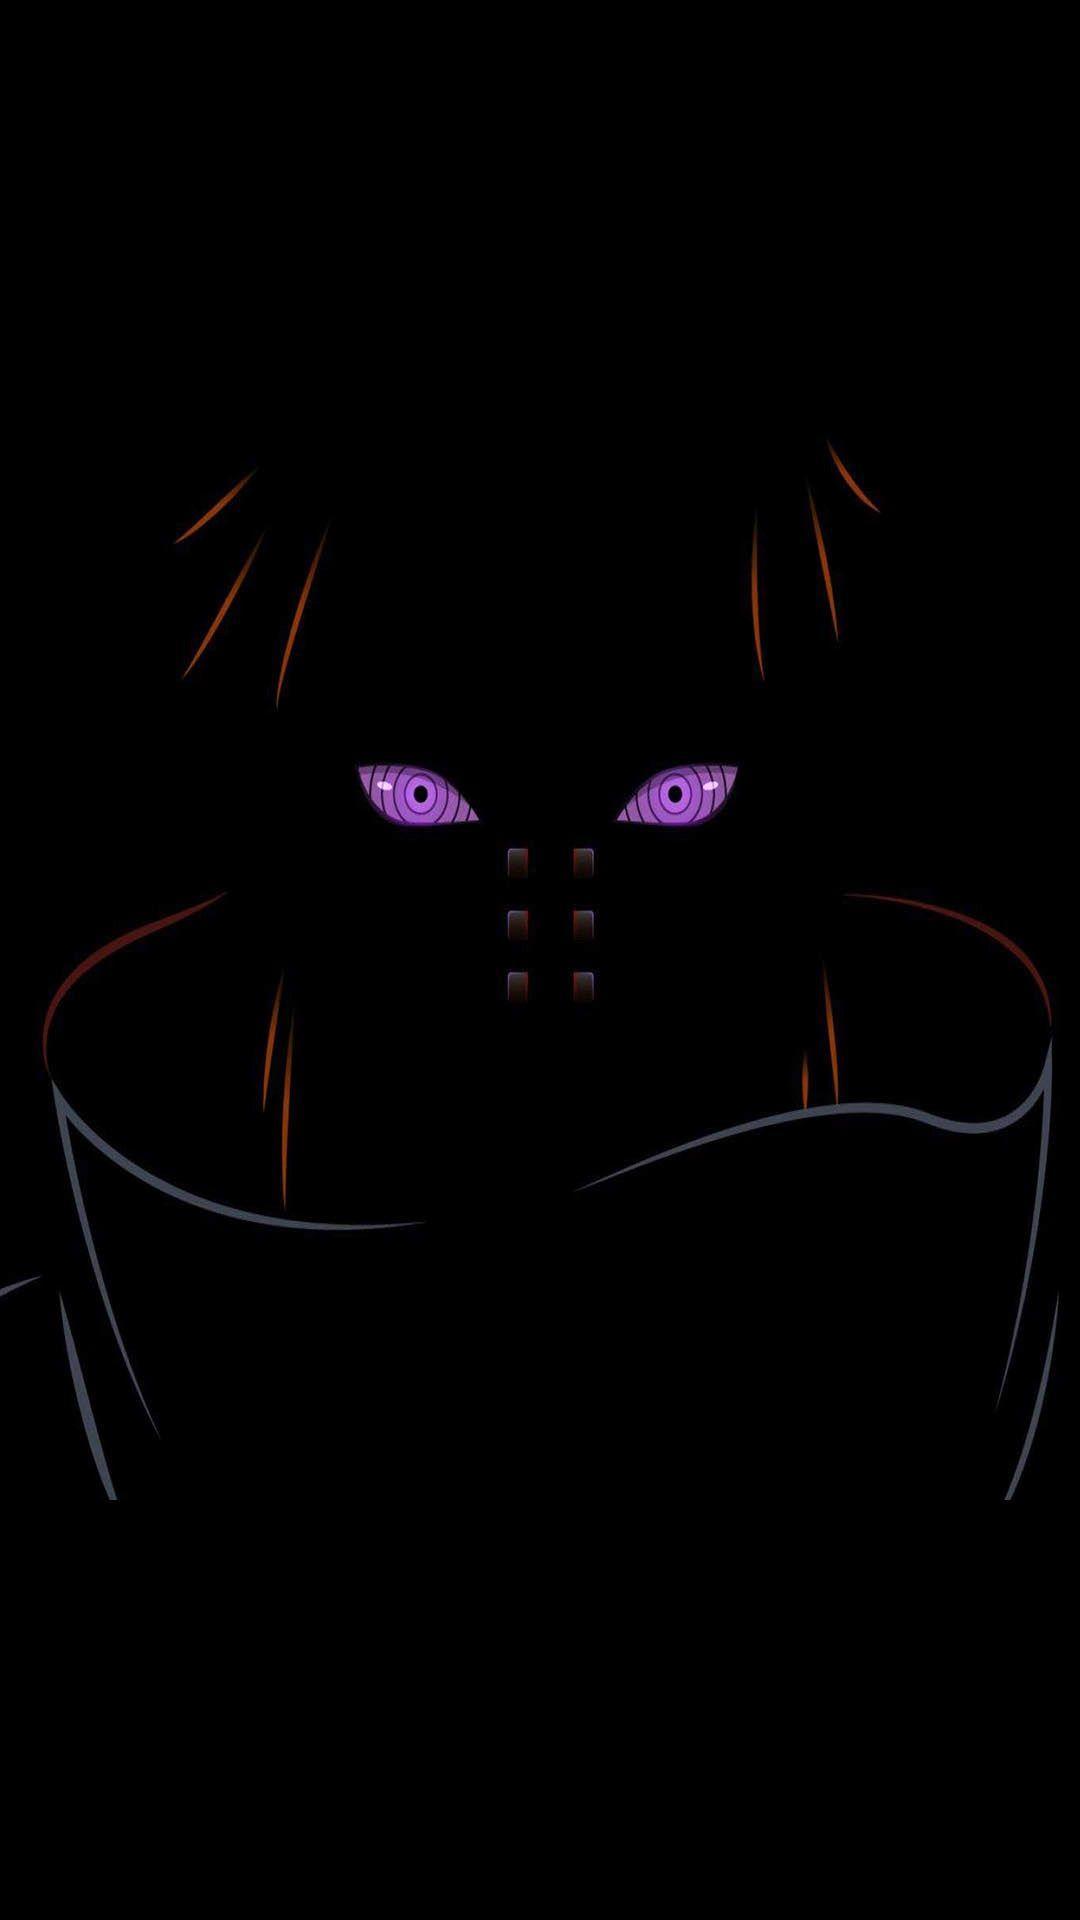 83 Gambar Naruto Rikudo Dan Sasuke Rinnegan Kekinian